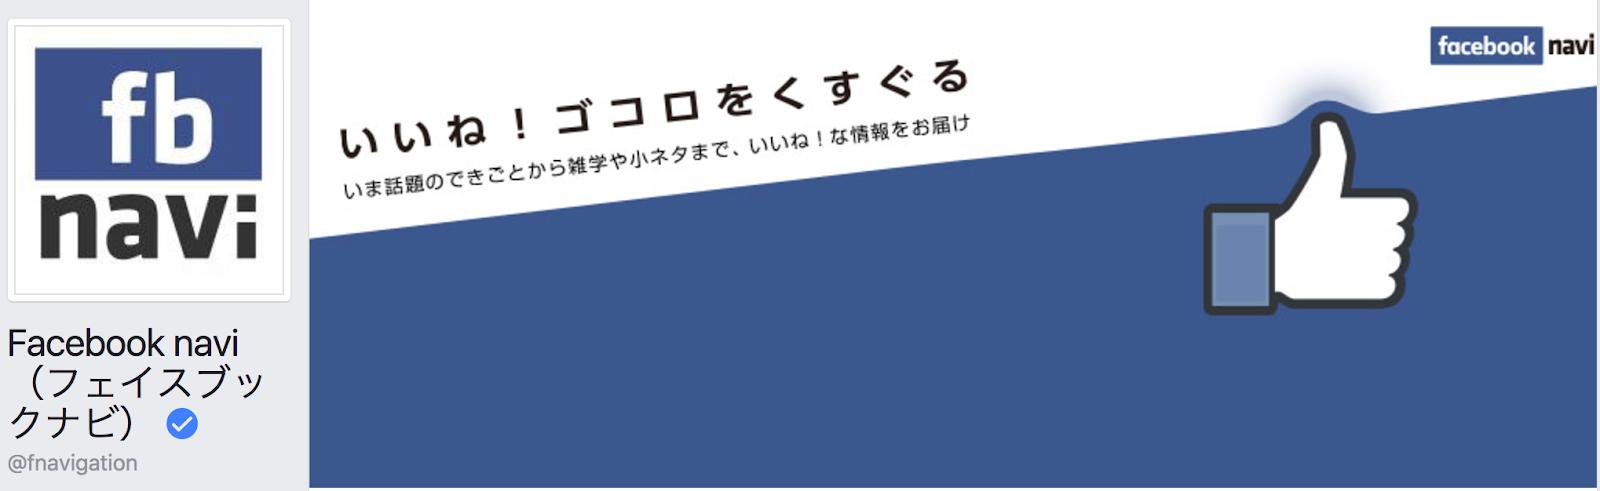 Facebook navi facebookページ 日本